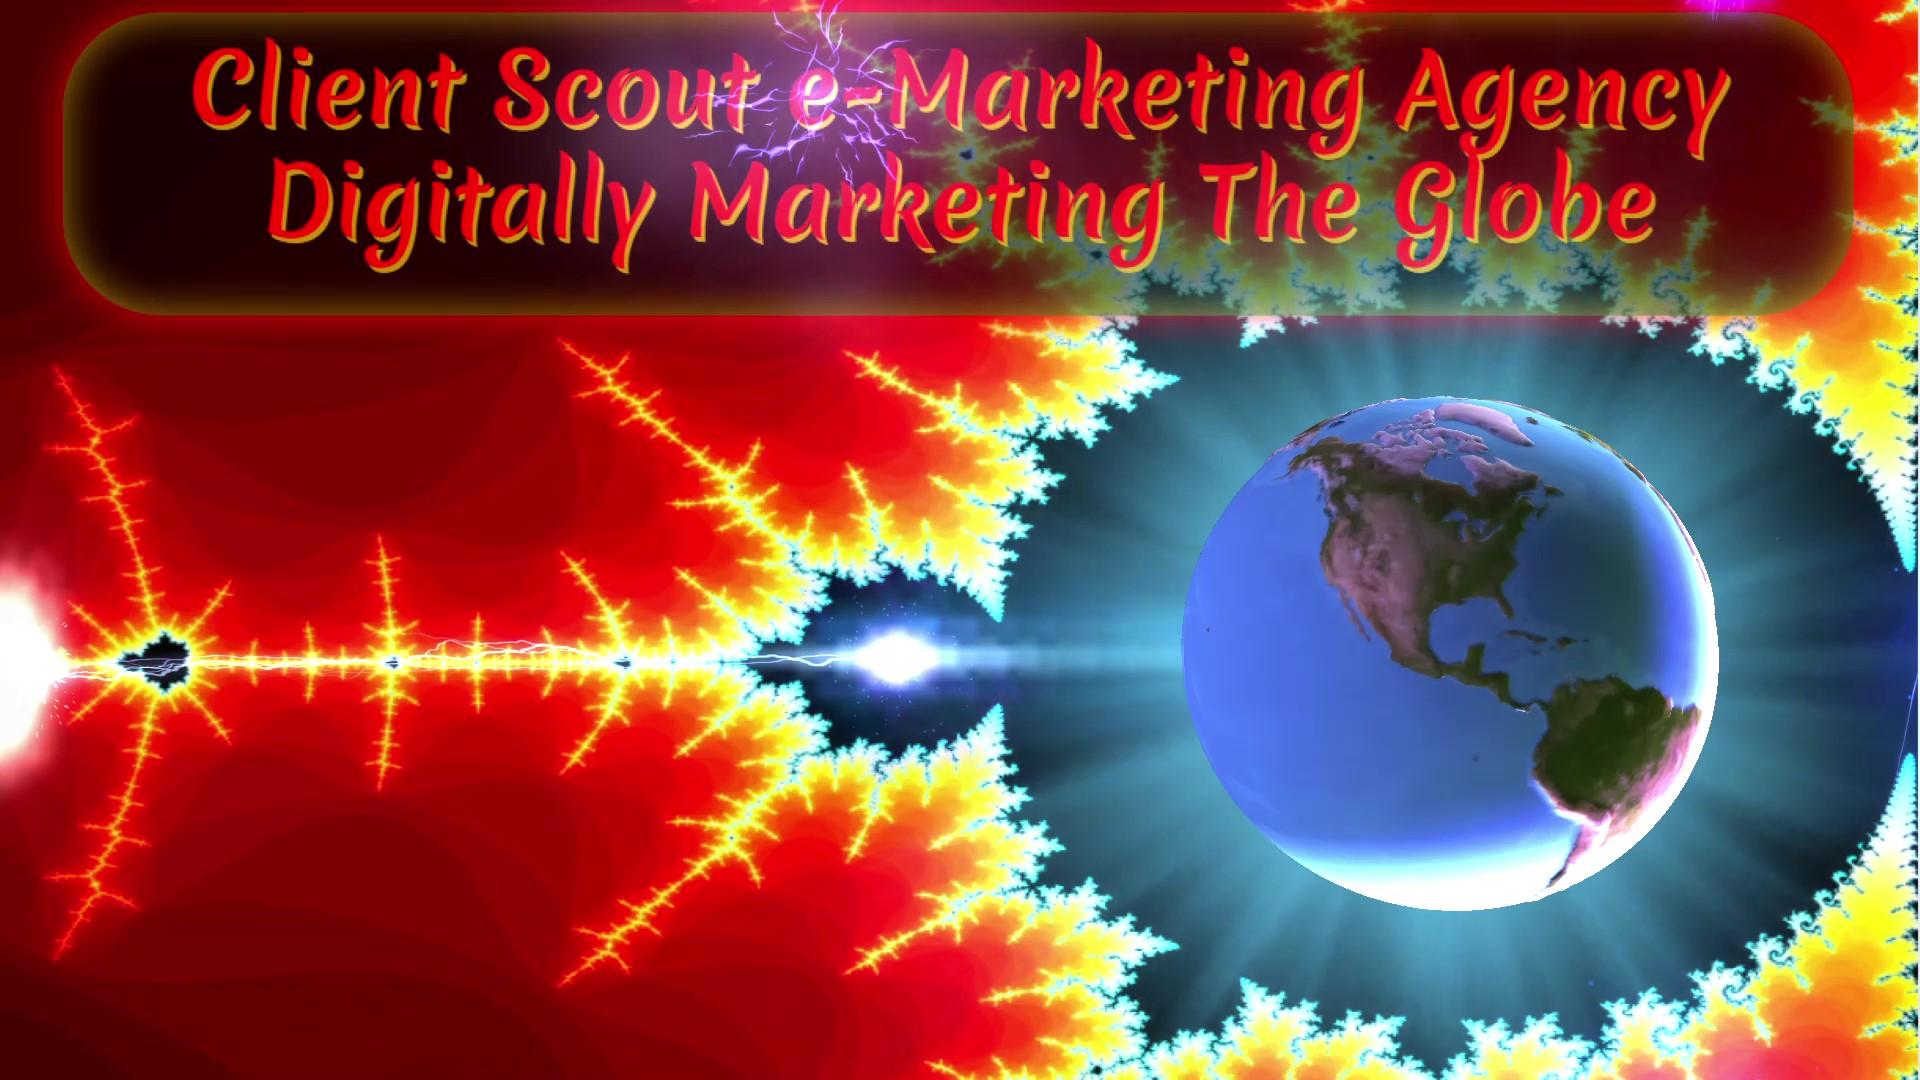 Digitally Marketing The Globe Logo 2